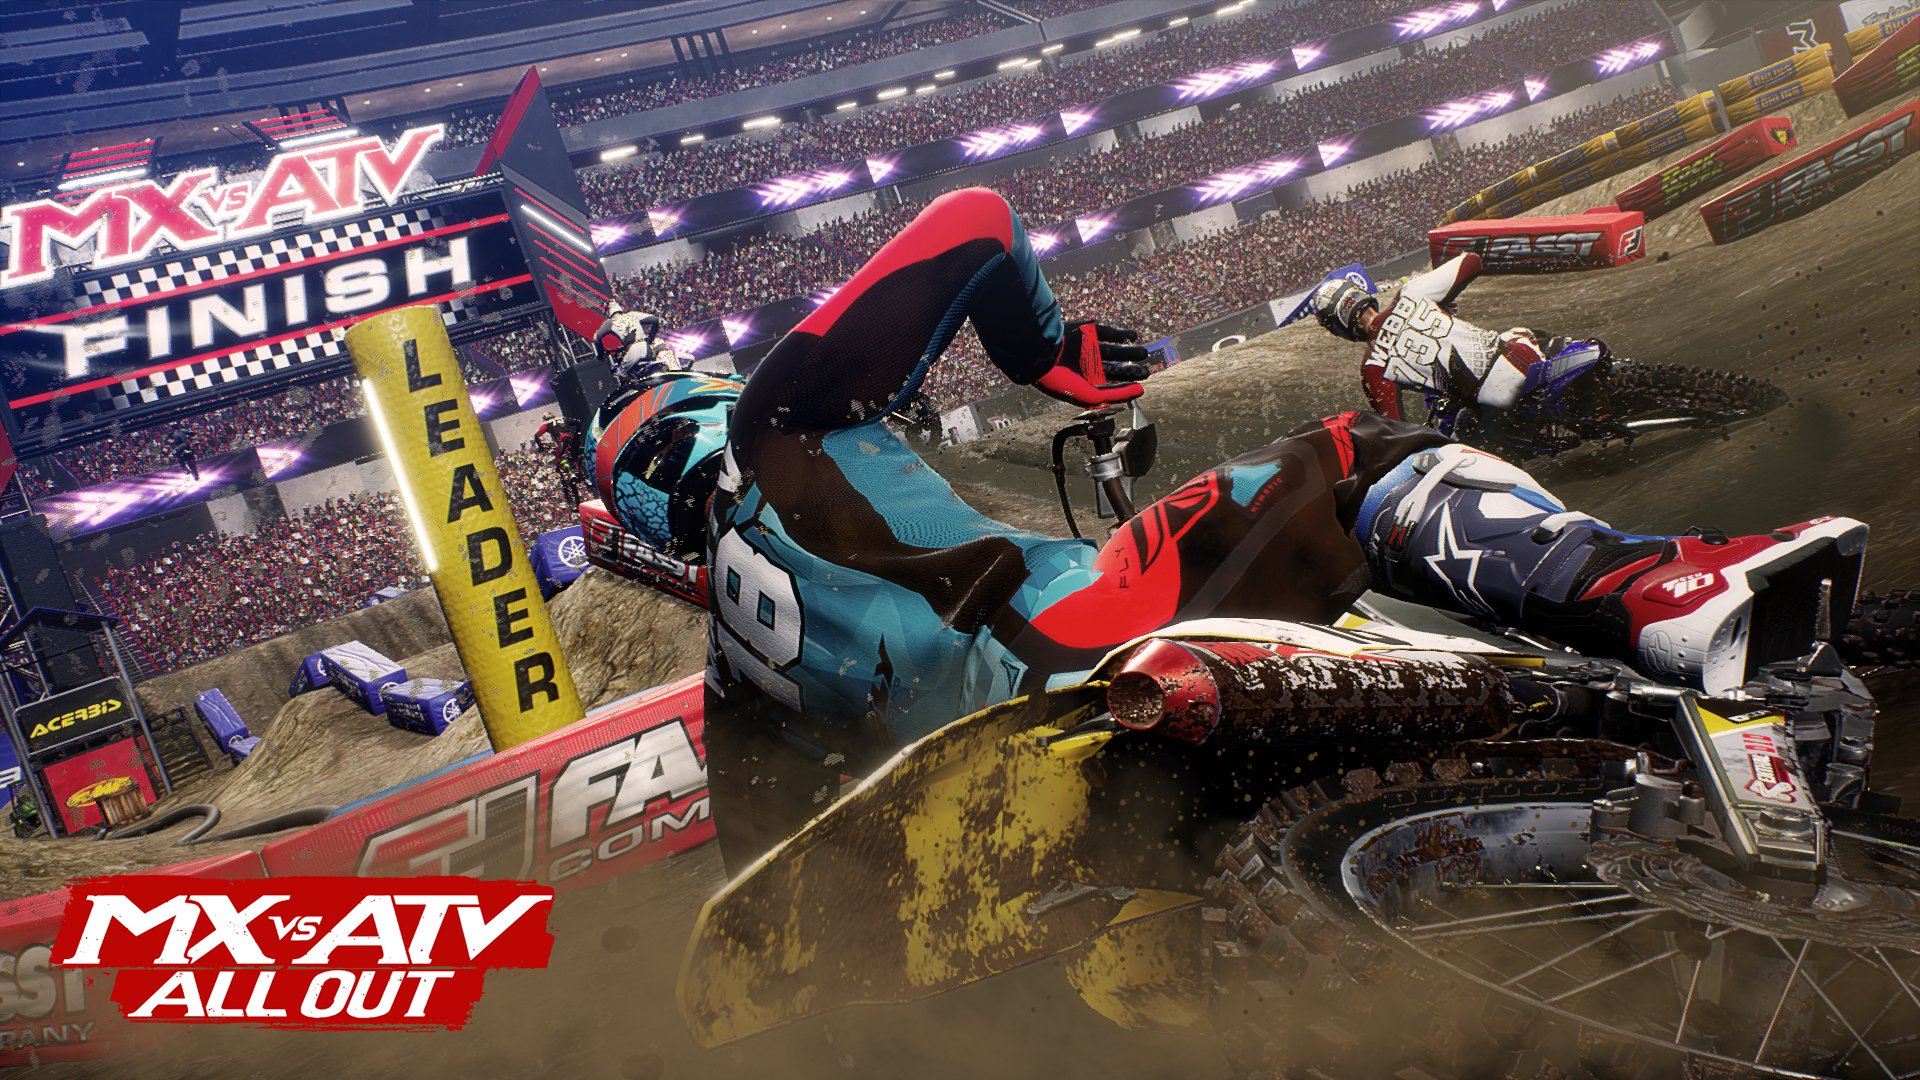 MX vs ATV All Out 10